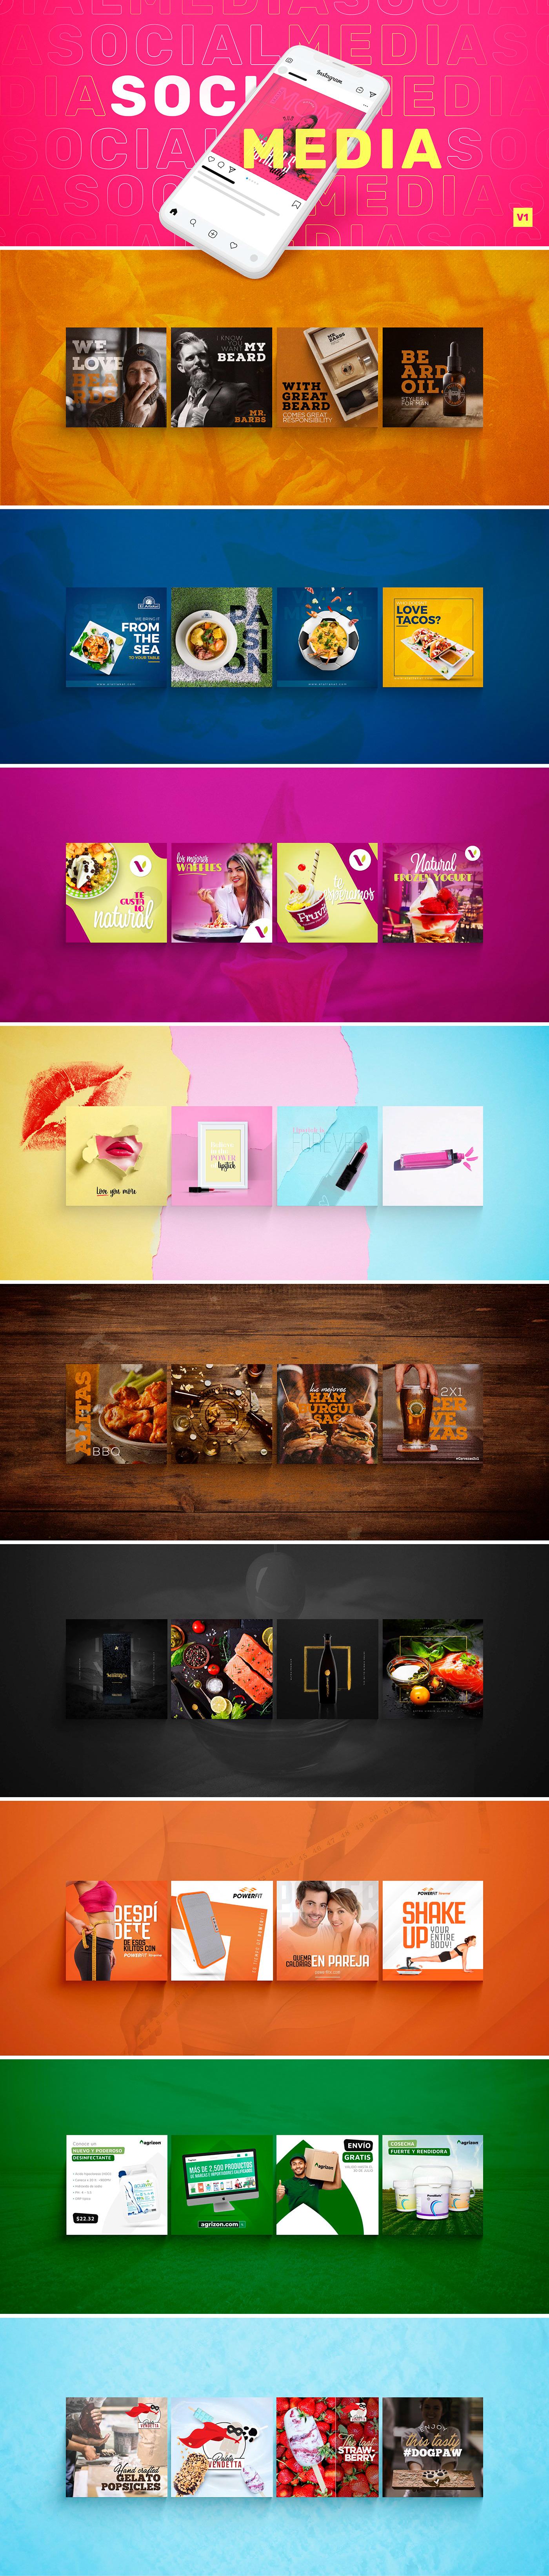 colors design graphic Illustrator instagram logo photo post social social media